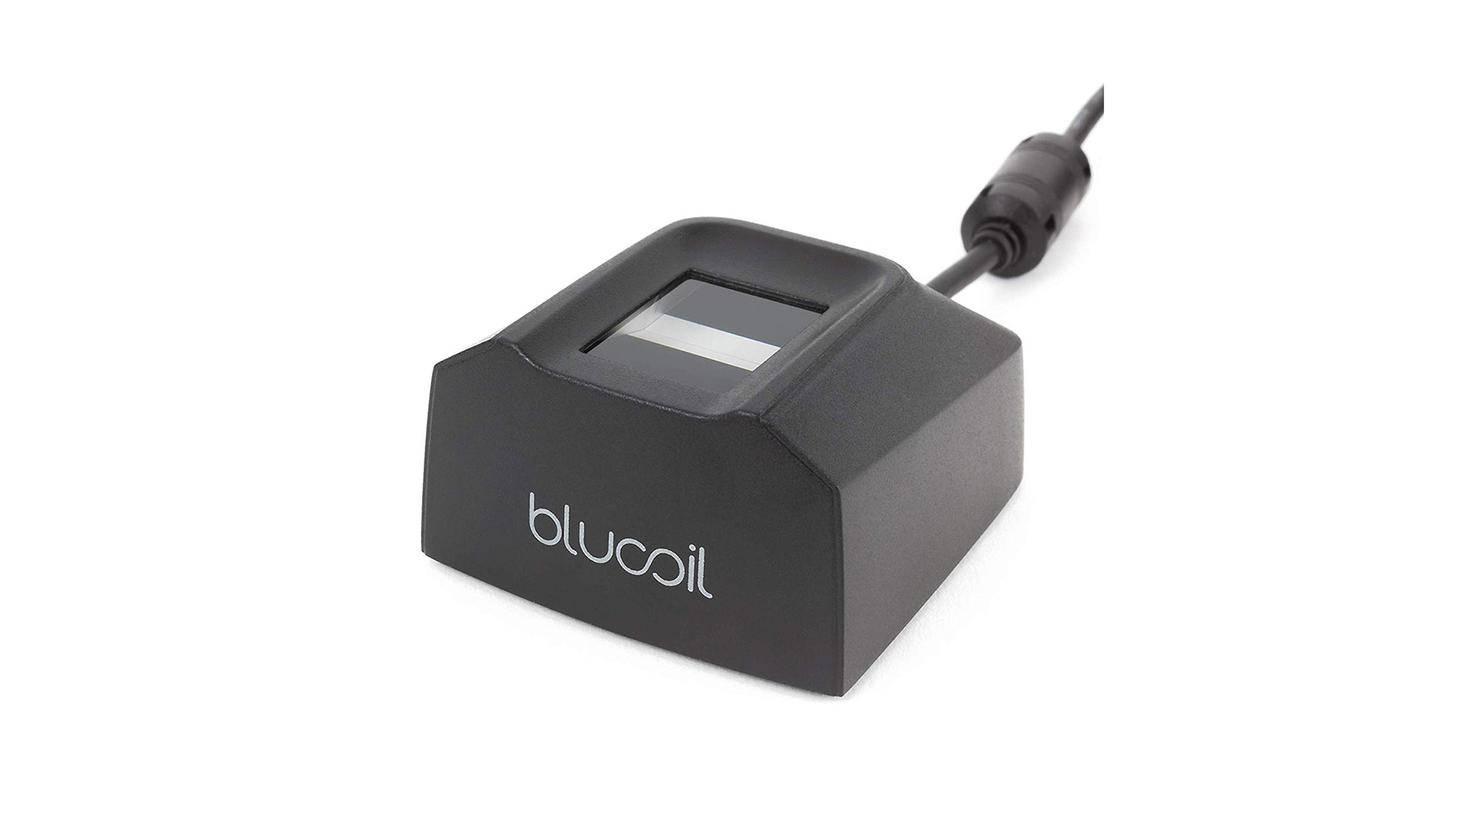 bluecoil